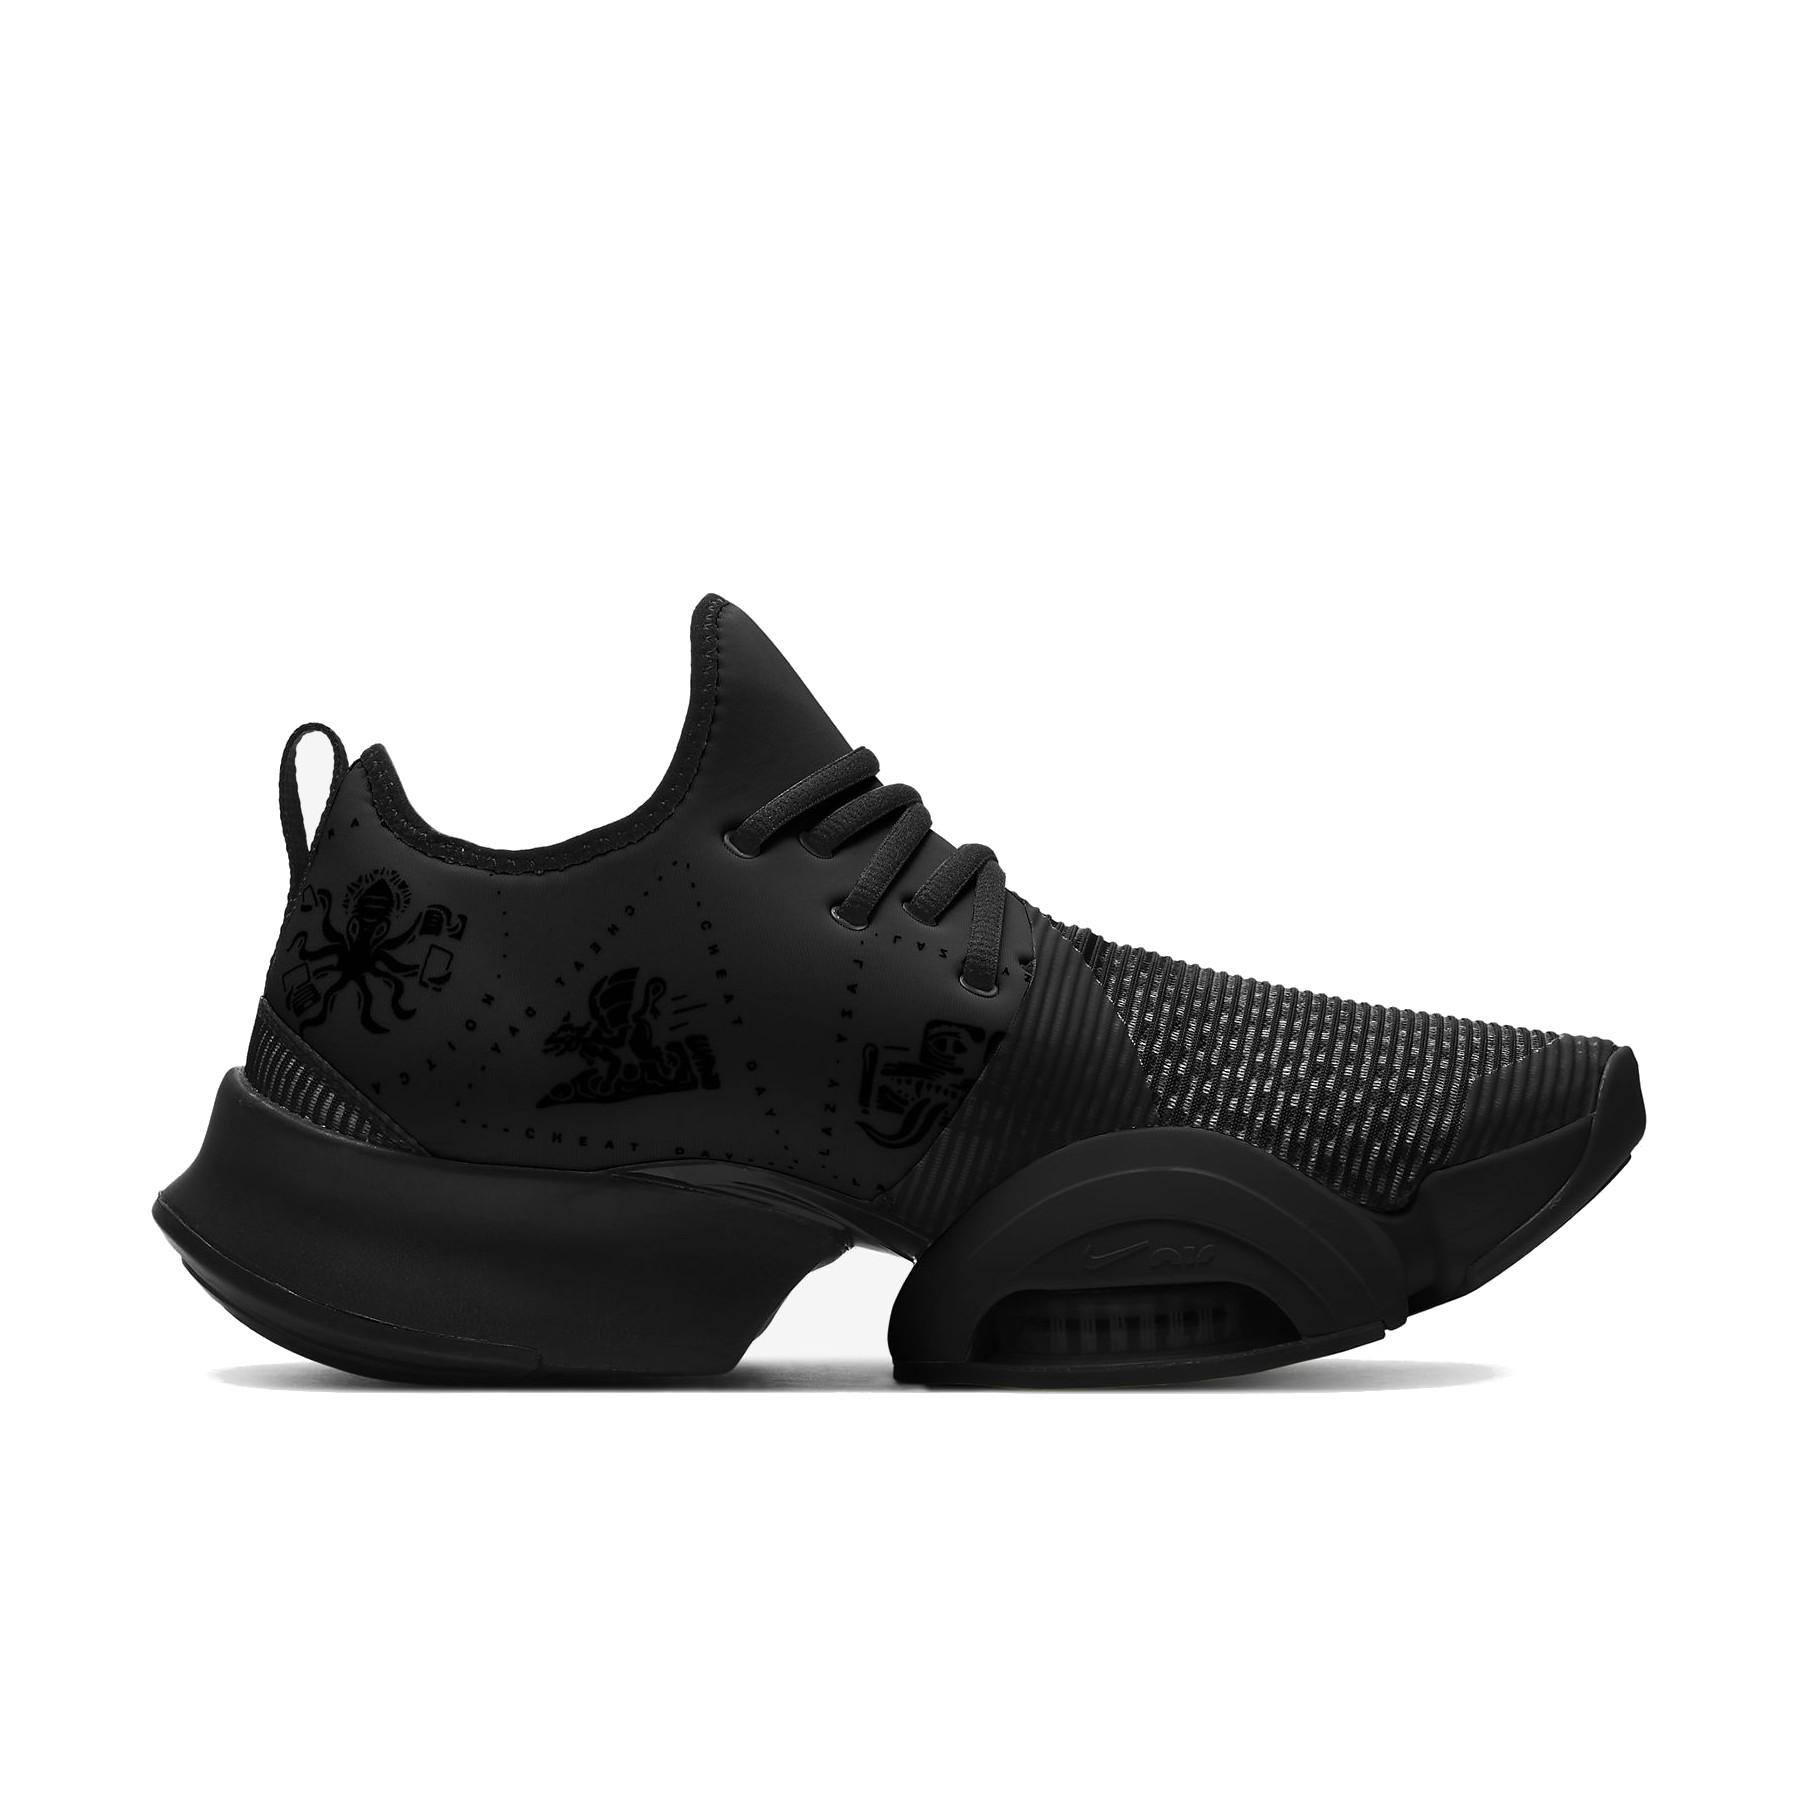 Nike Air Zoom SuperRep Herren Trainingsschuh - black/black-black-anthracite CD3460-001